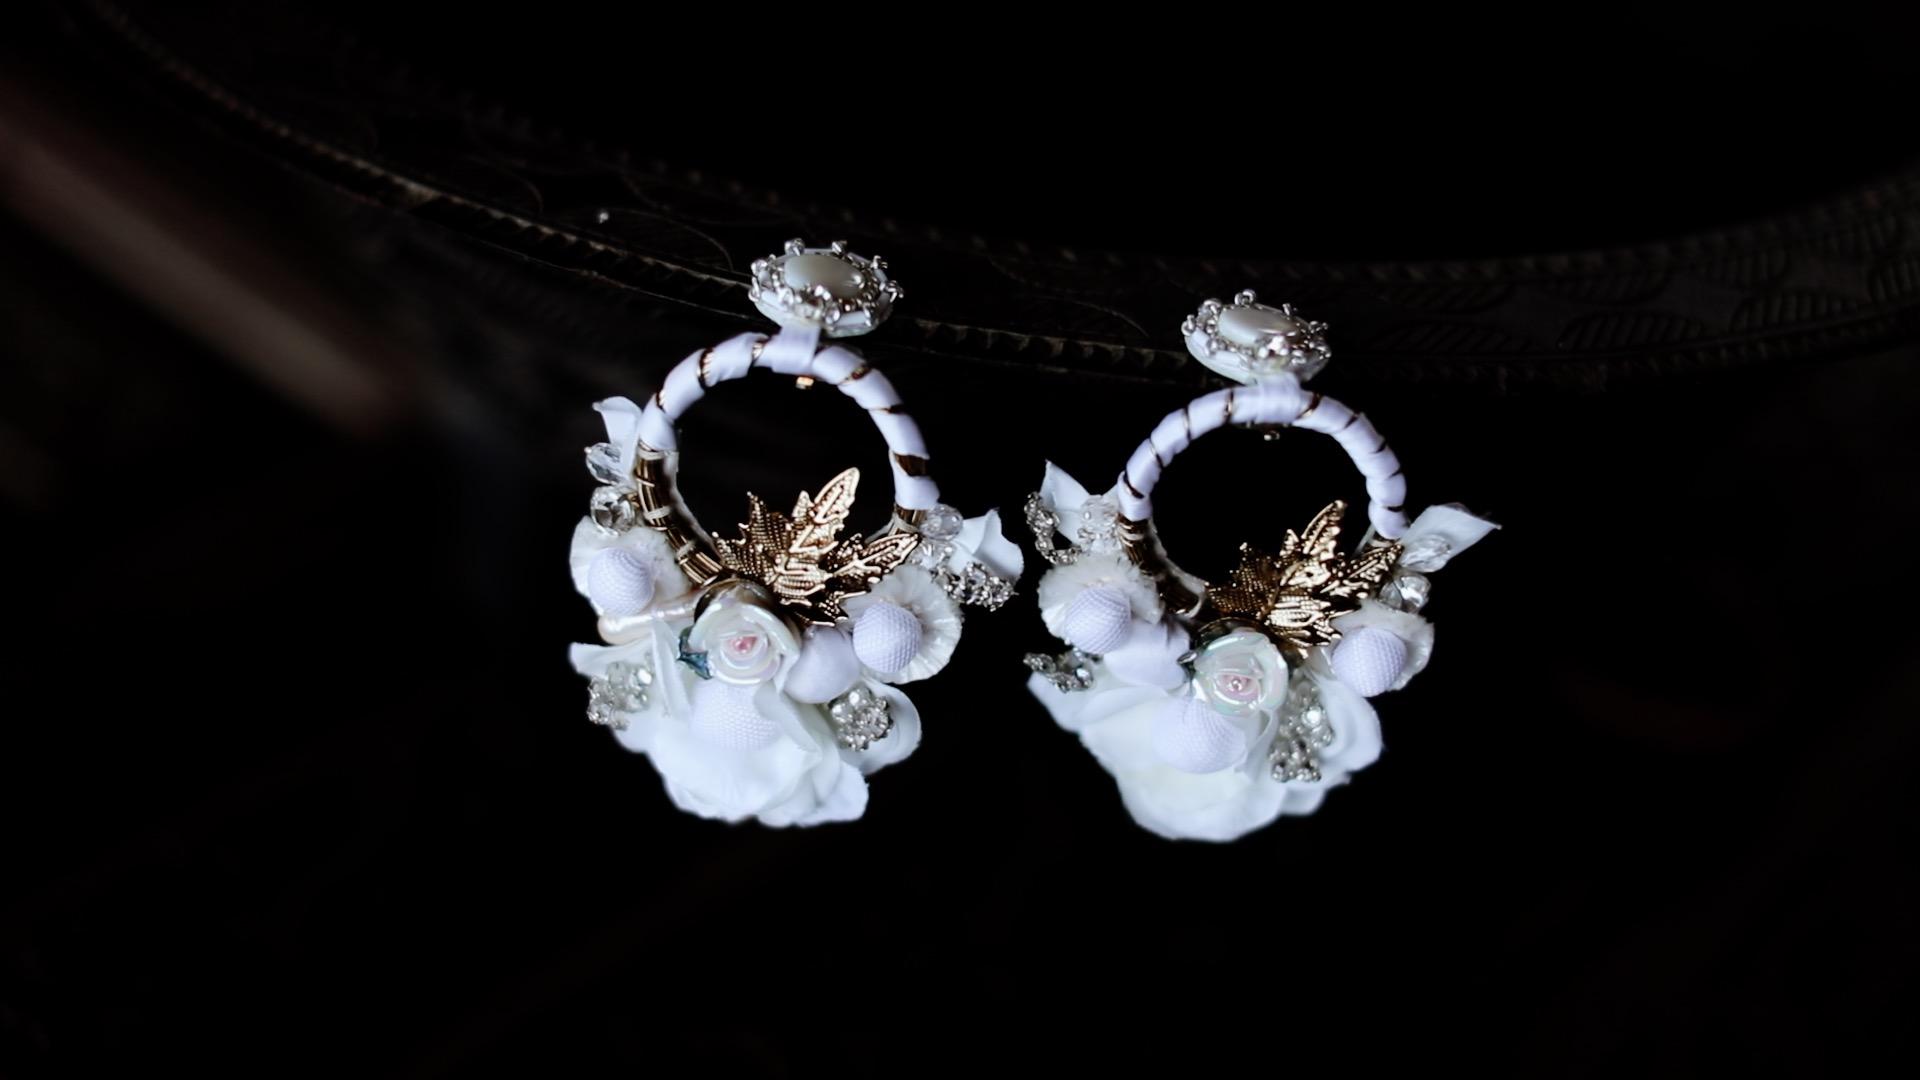 Boho-Inspired Statement Earrings Sayulita Mexico Destination Wedding